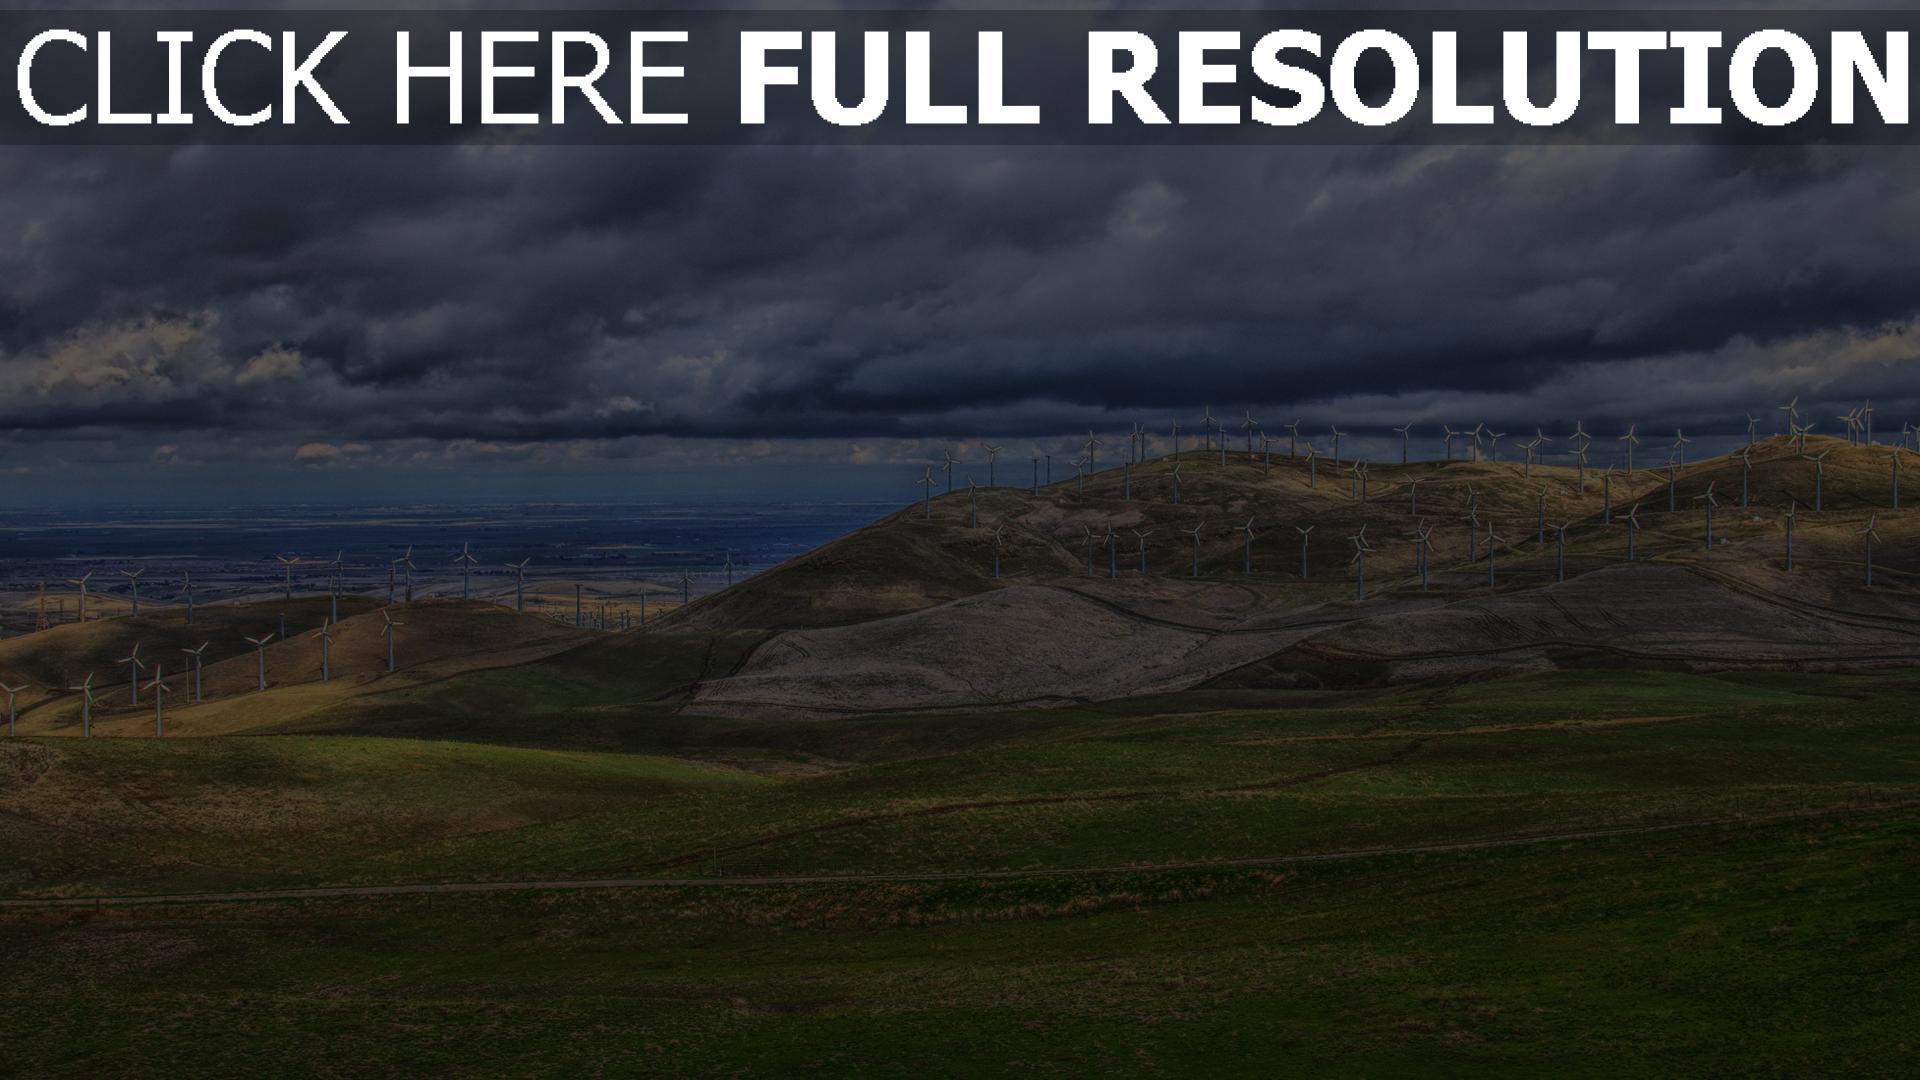 hd hintergrundbilder hügel bucht himmel windmühlen meer 1920x1080